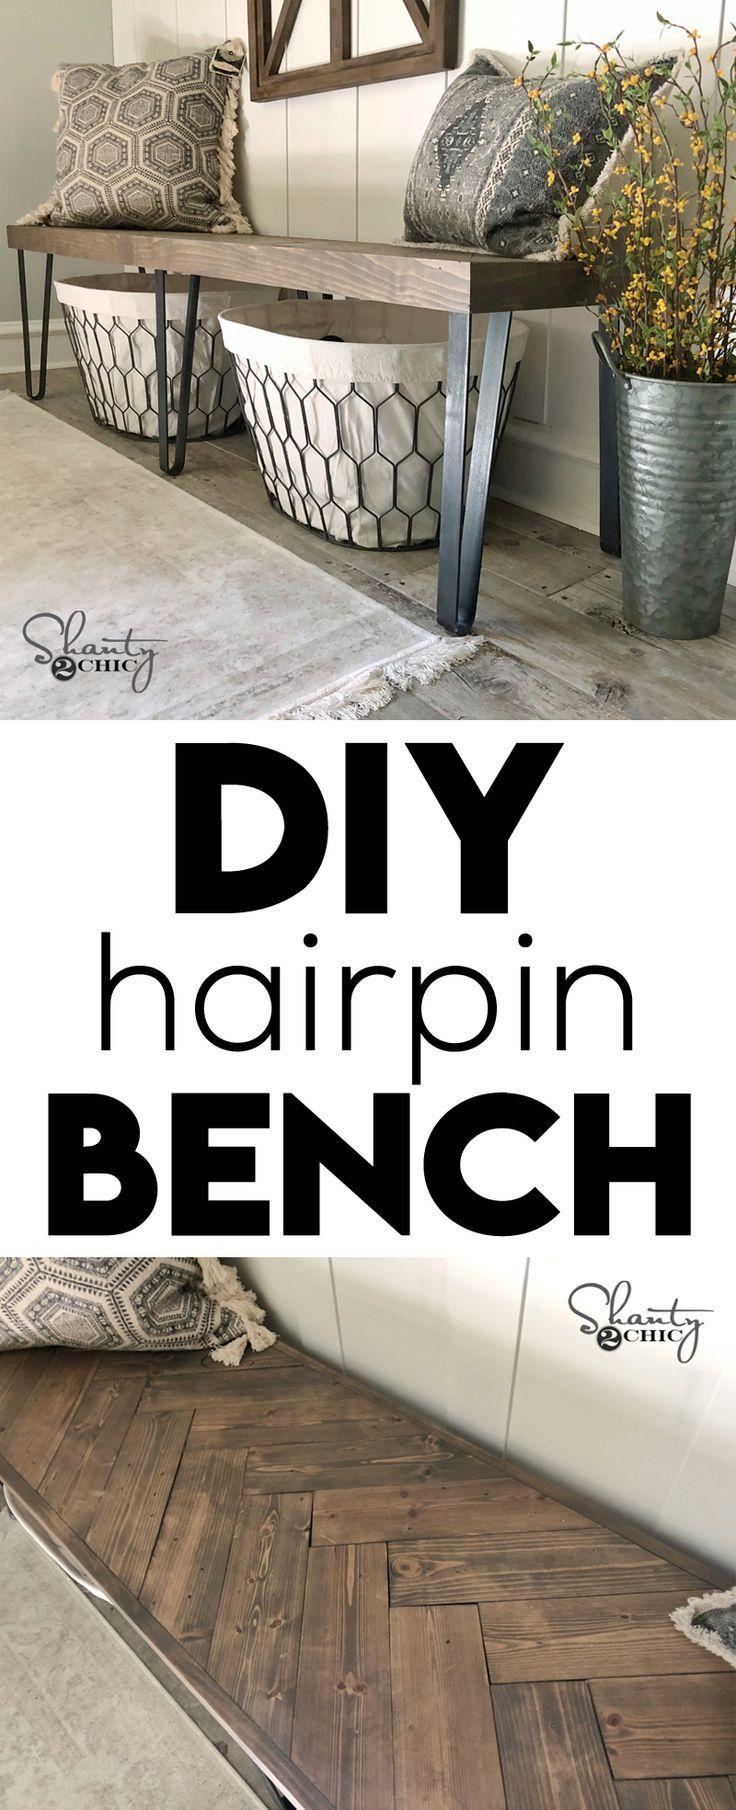 DIY Beefy Hairpin Bench - Shanty 2 Chic